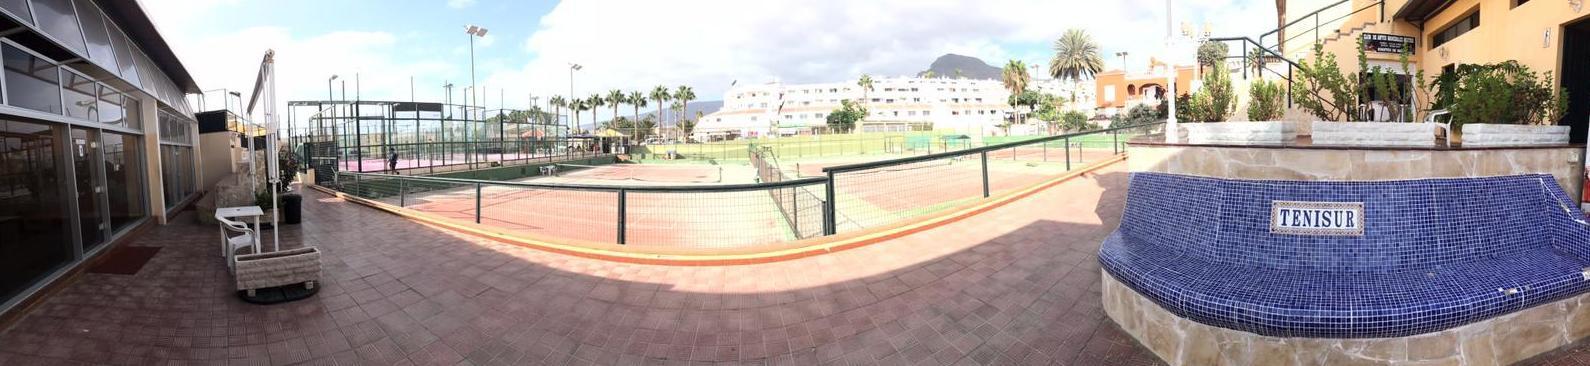 Vista canchas de tenis panorámicas CENTRO DEPORTIVO TENISUR